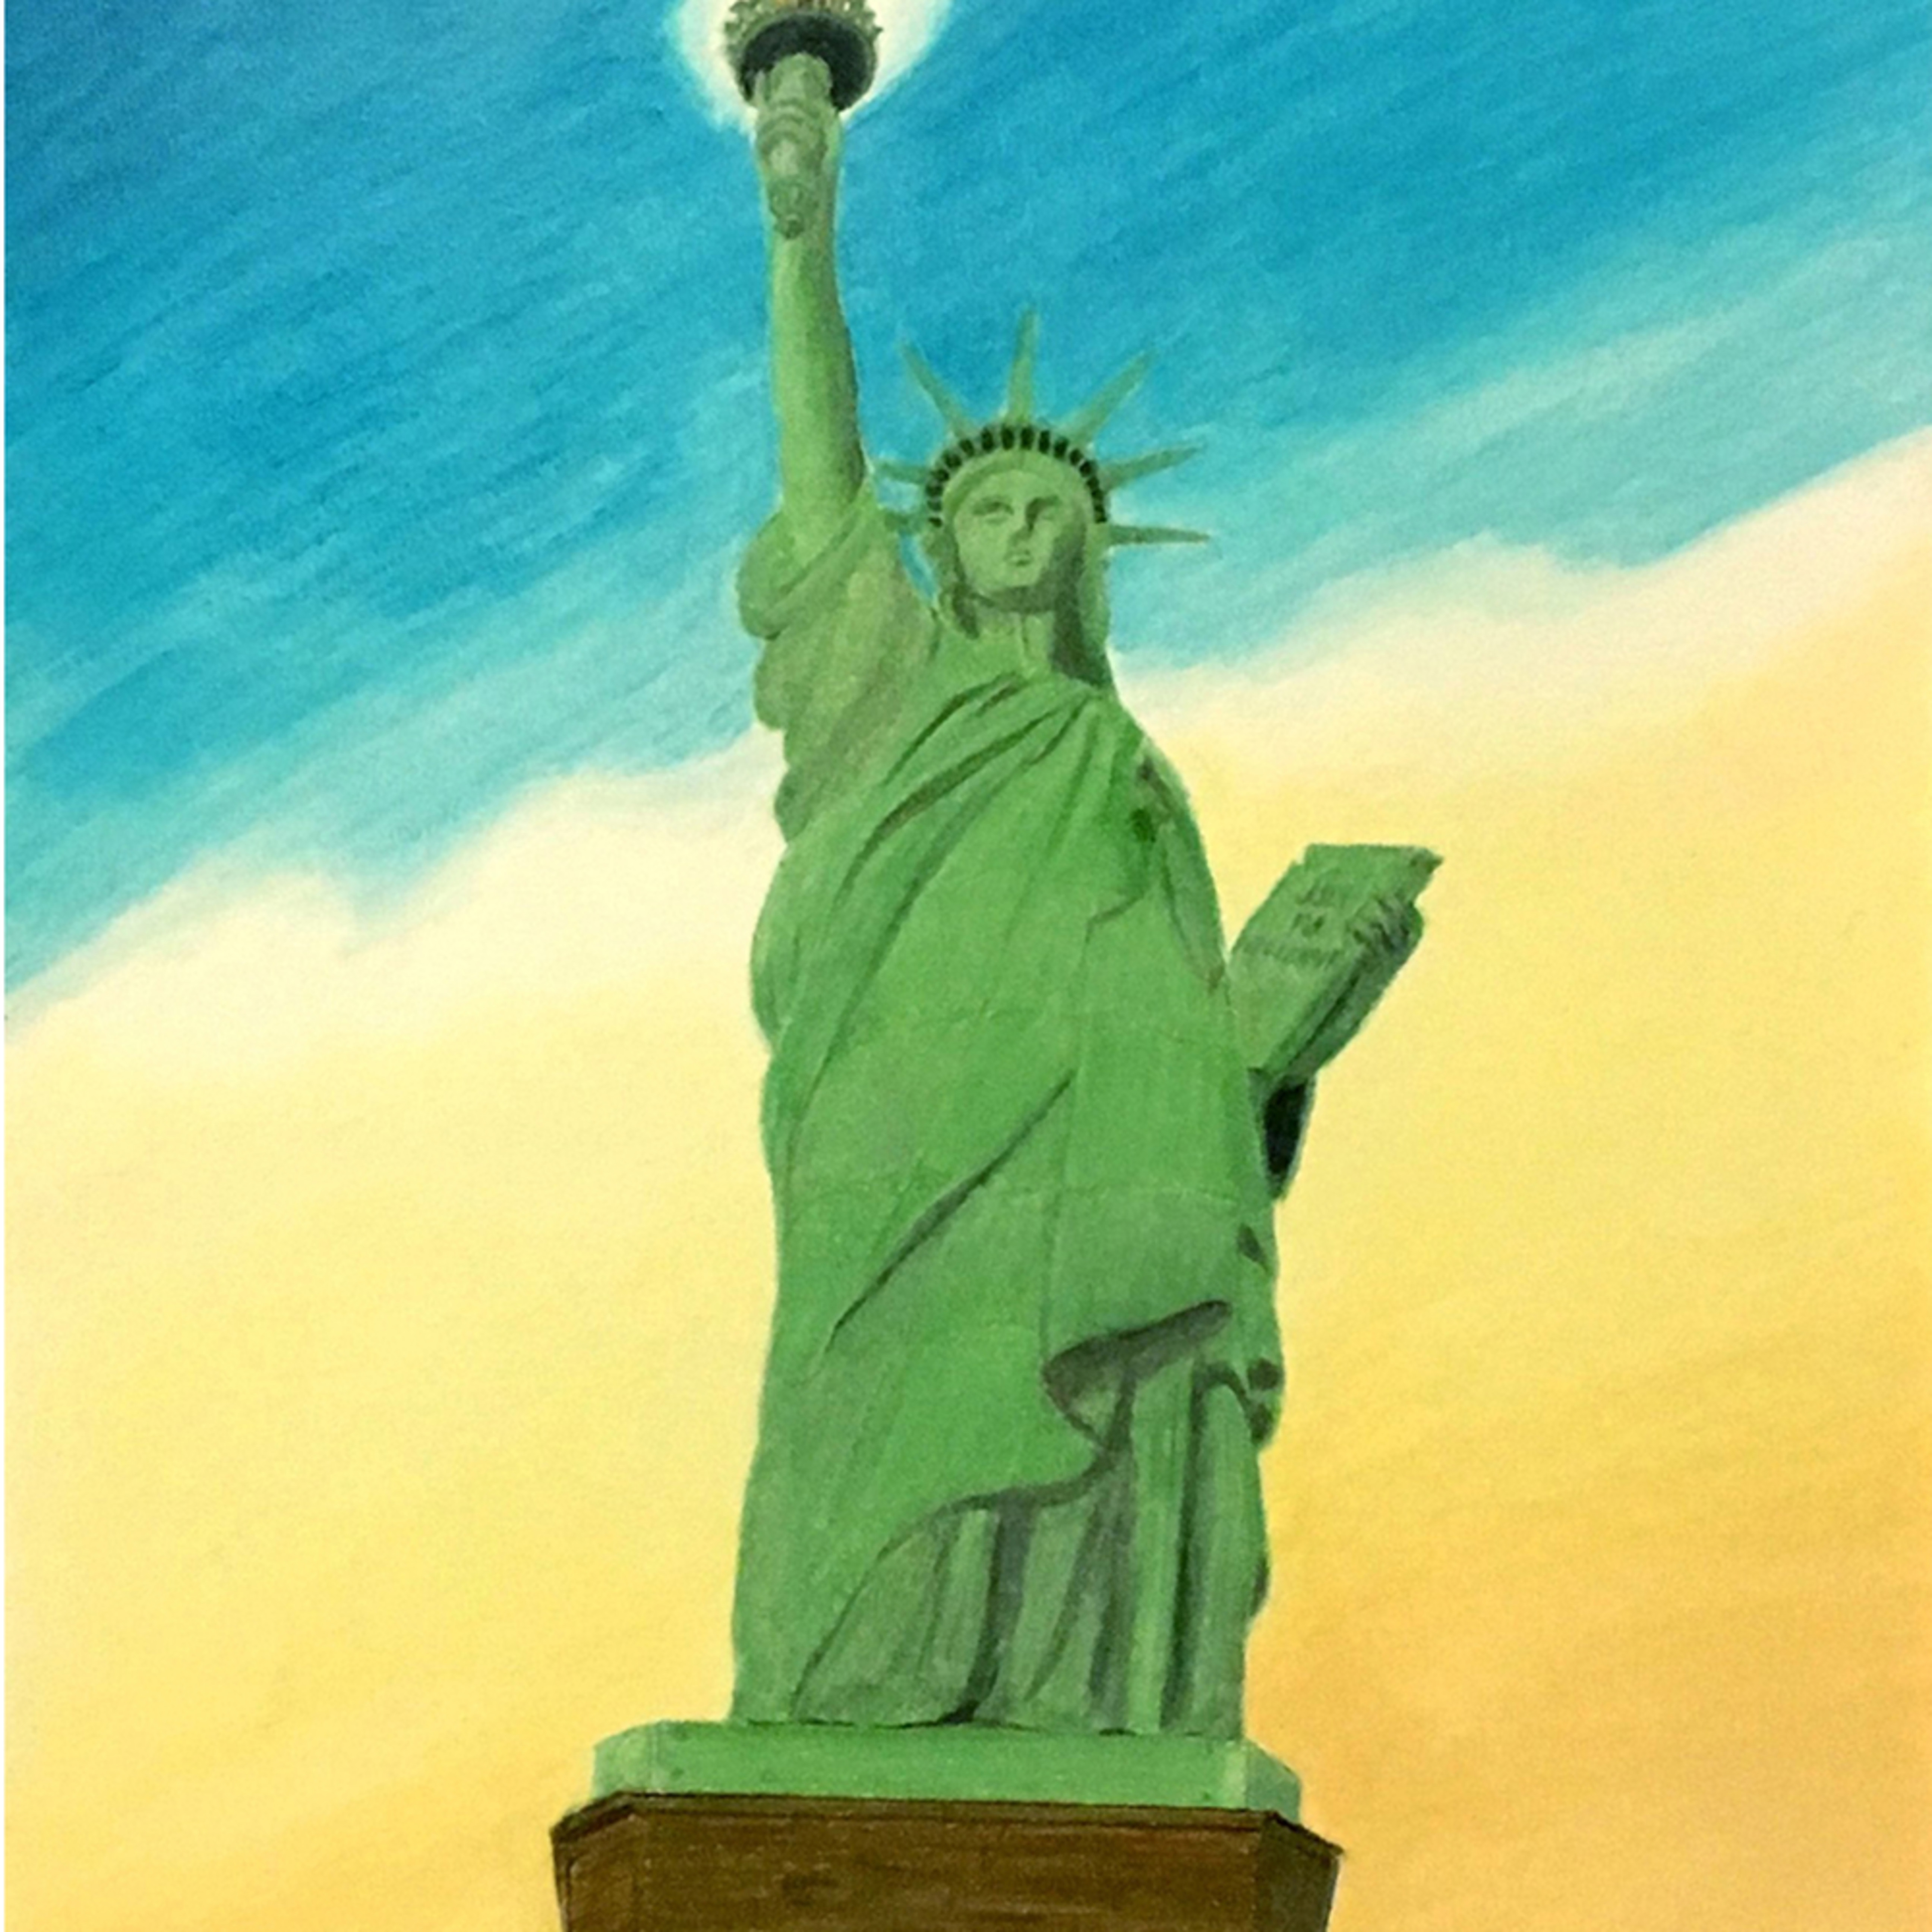 Lady liberty jv7mee